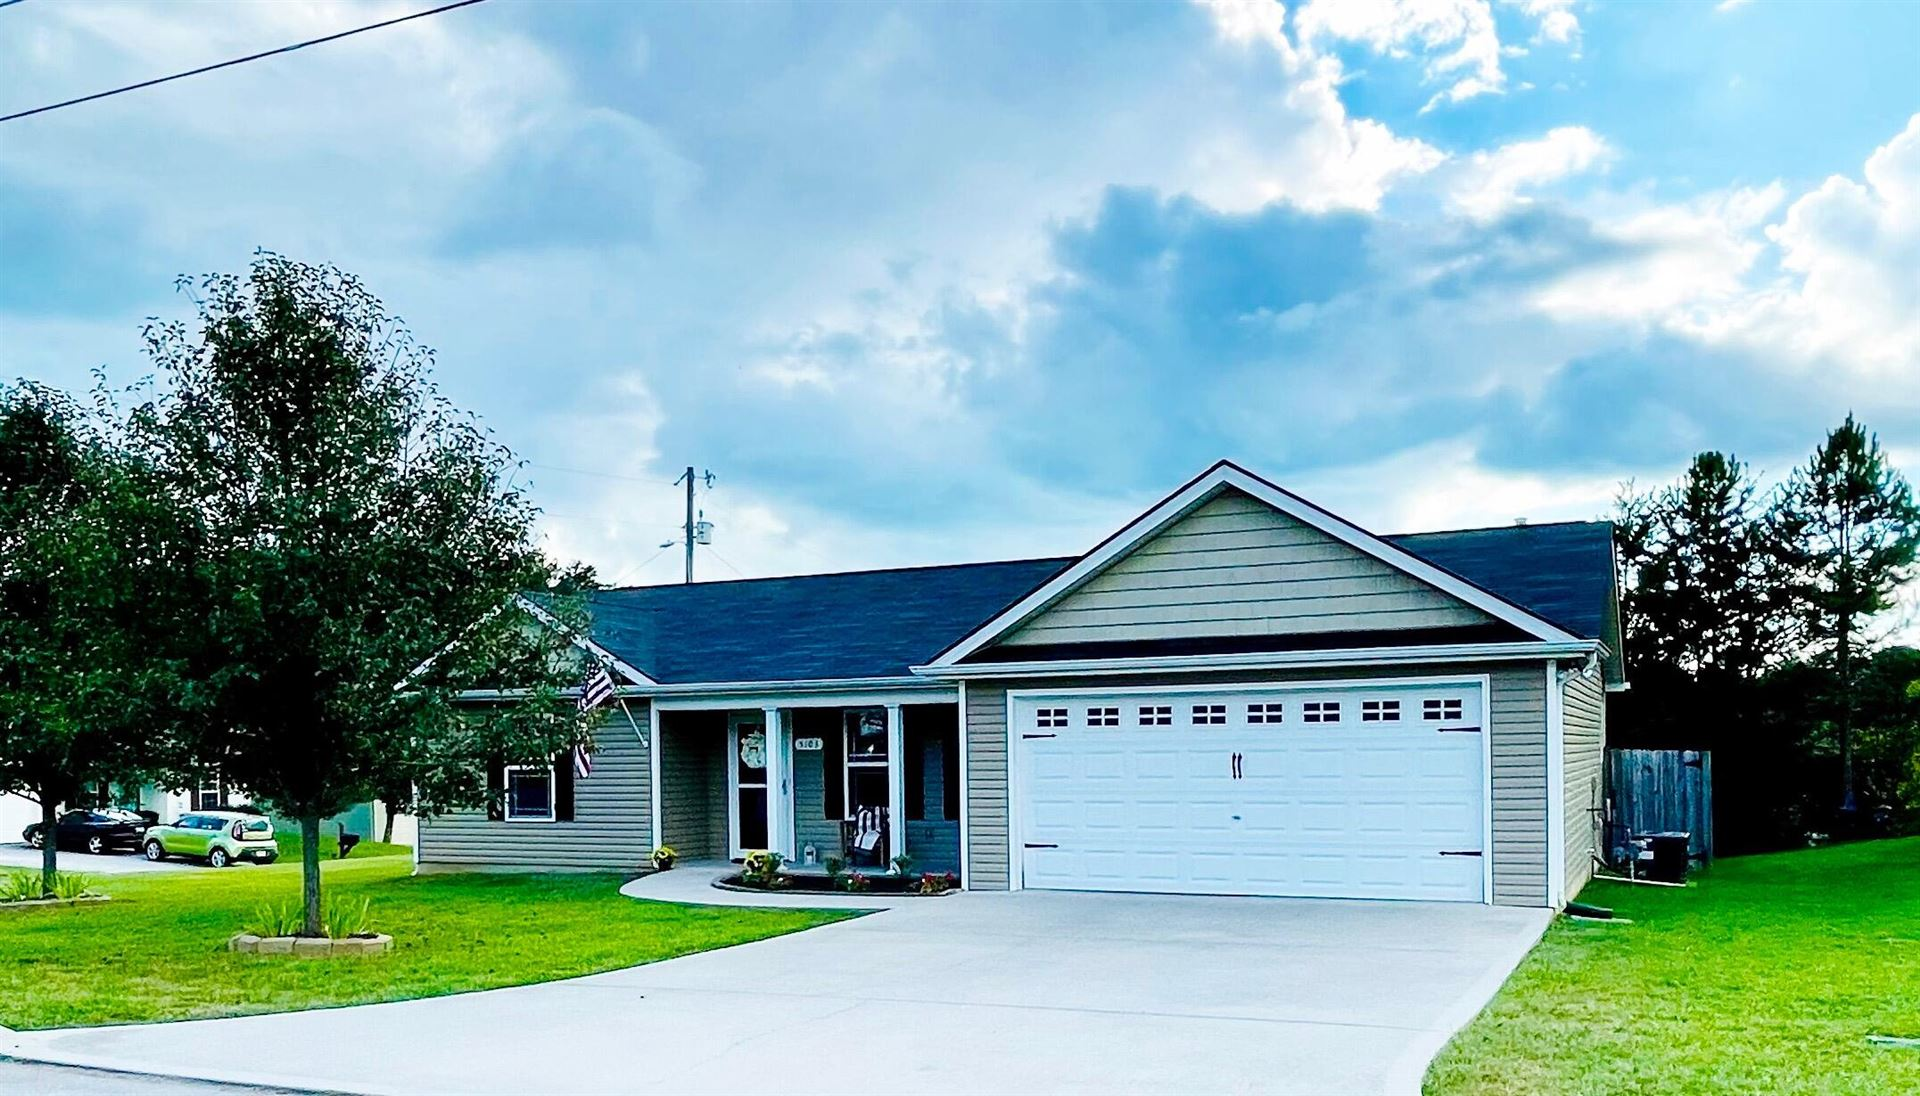 Photo of 5103 Cedar Knoll Lane, Corryton, TN 37721 (MLS # 1167853)